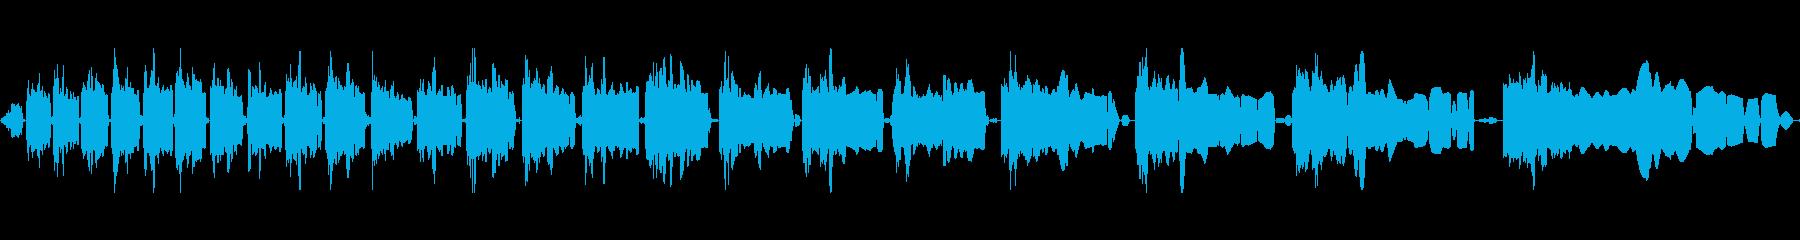 SynthSwipe EC06_55_2の再生済みの波形